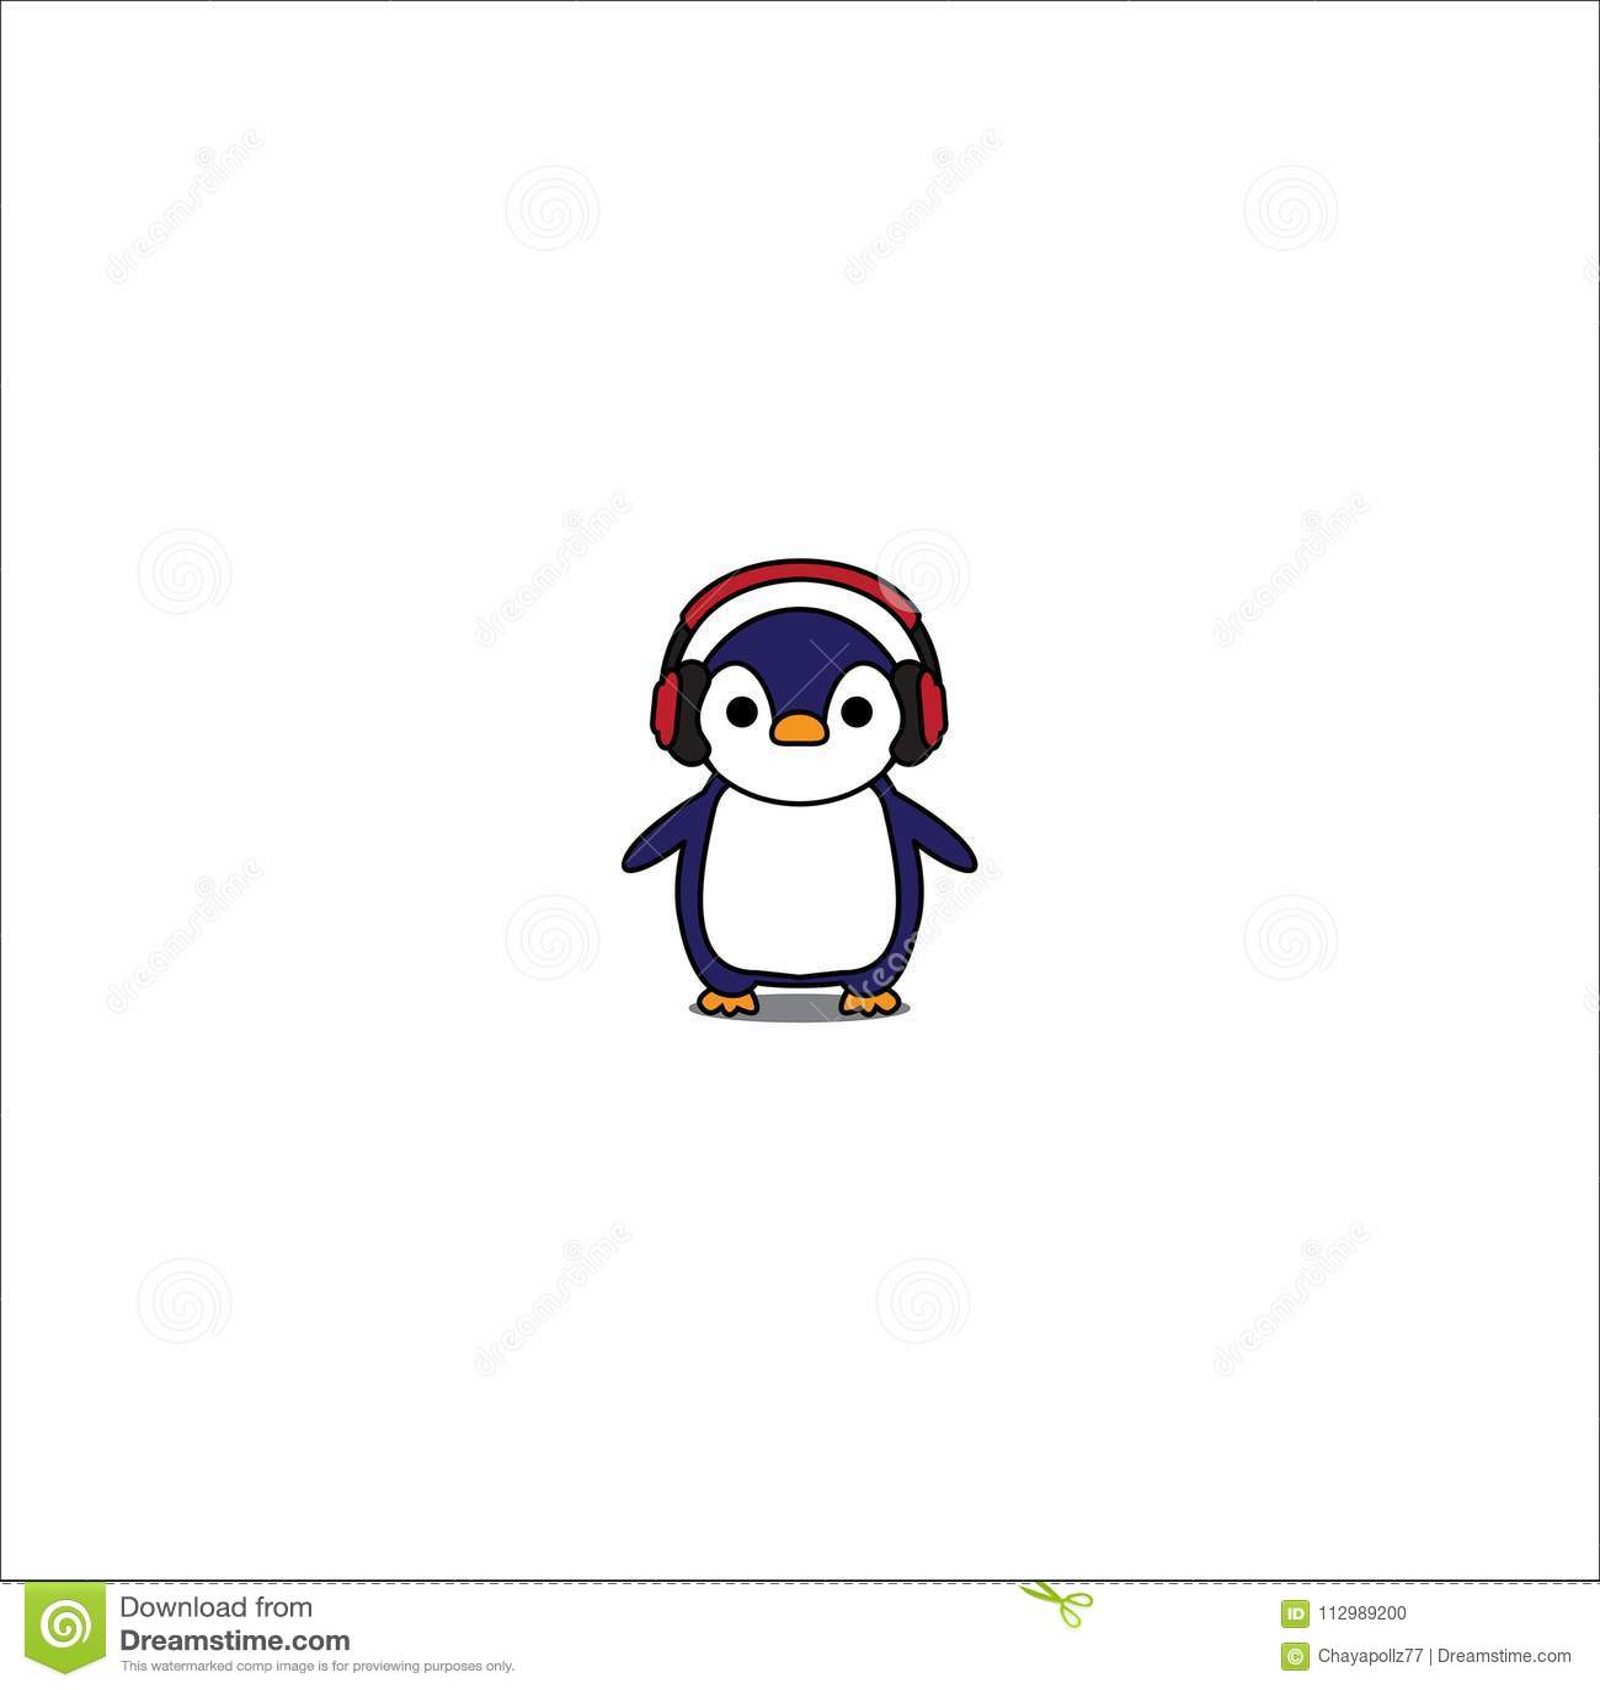 Cute penguin cartoon with red headphones icon